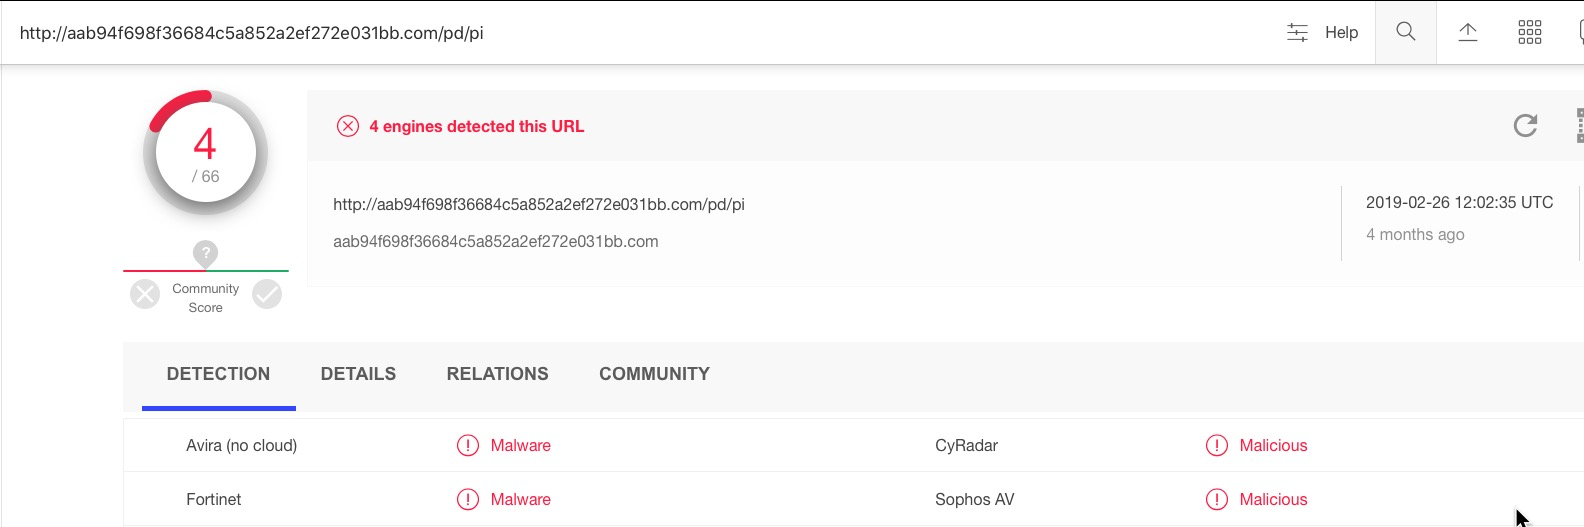 image of malicious url